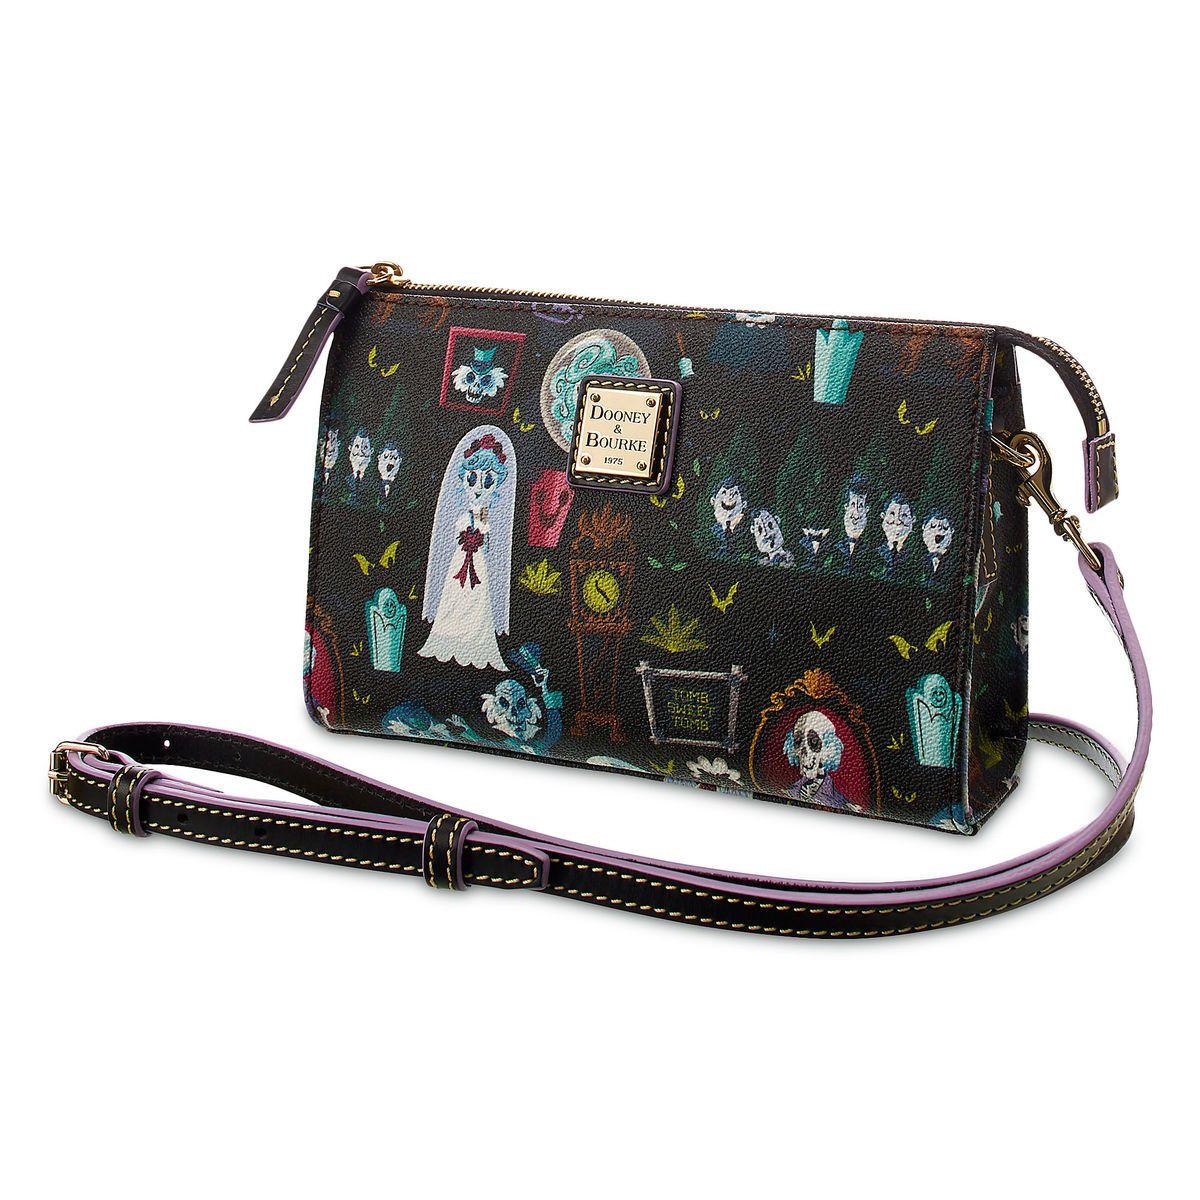 Haunted Mansion Crossbody Bag By Dooney Bourke Disney Dooney Dooney Bourke Dooney